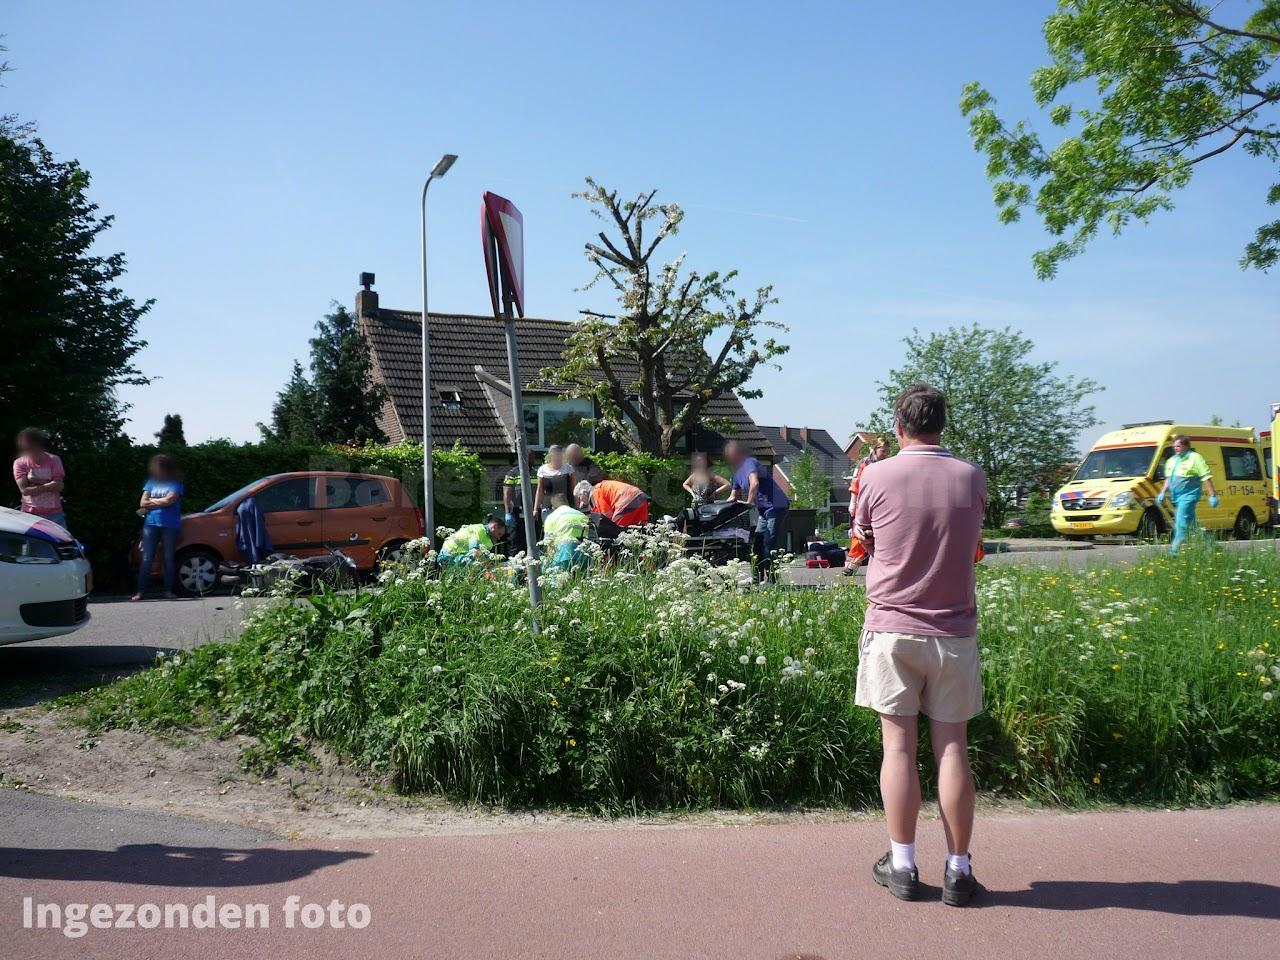 P1170218_blur.jpg